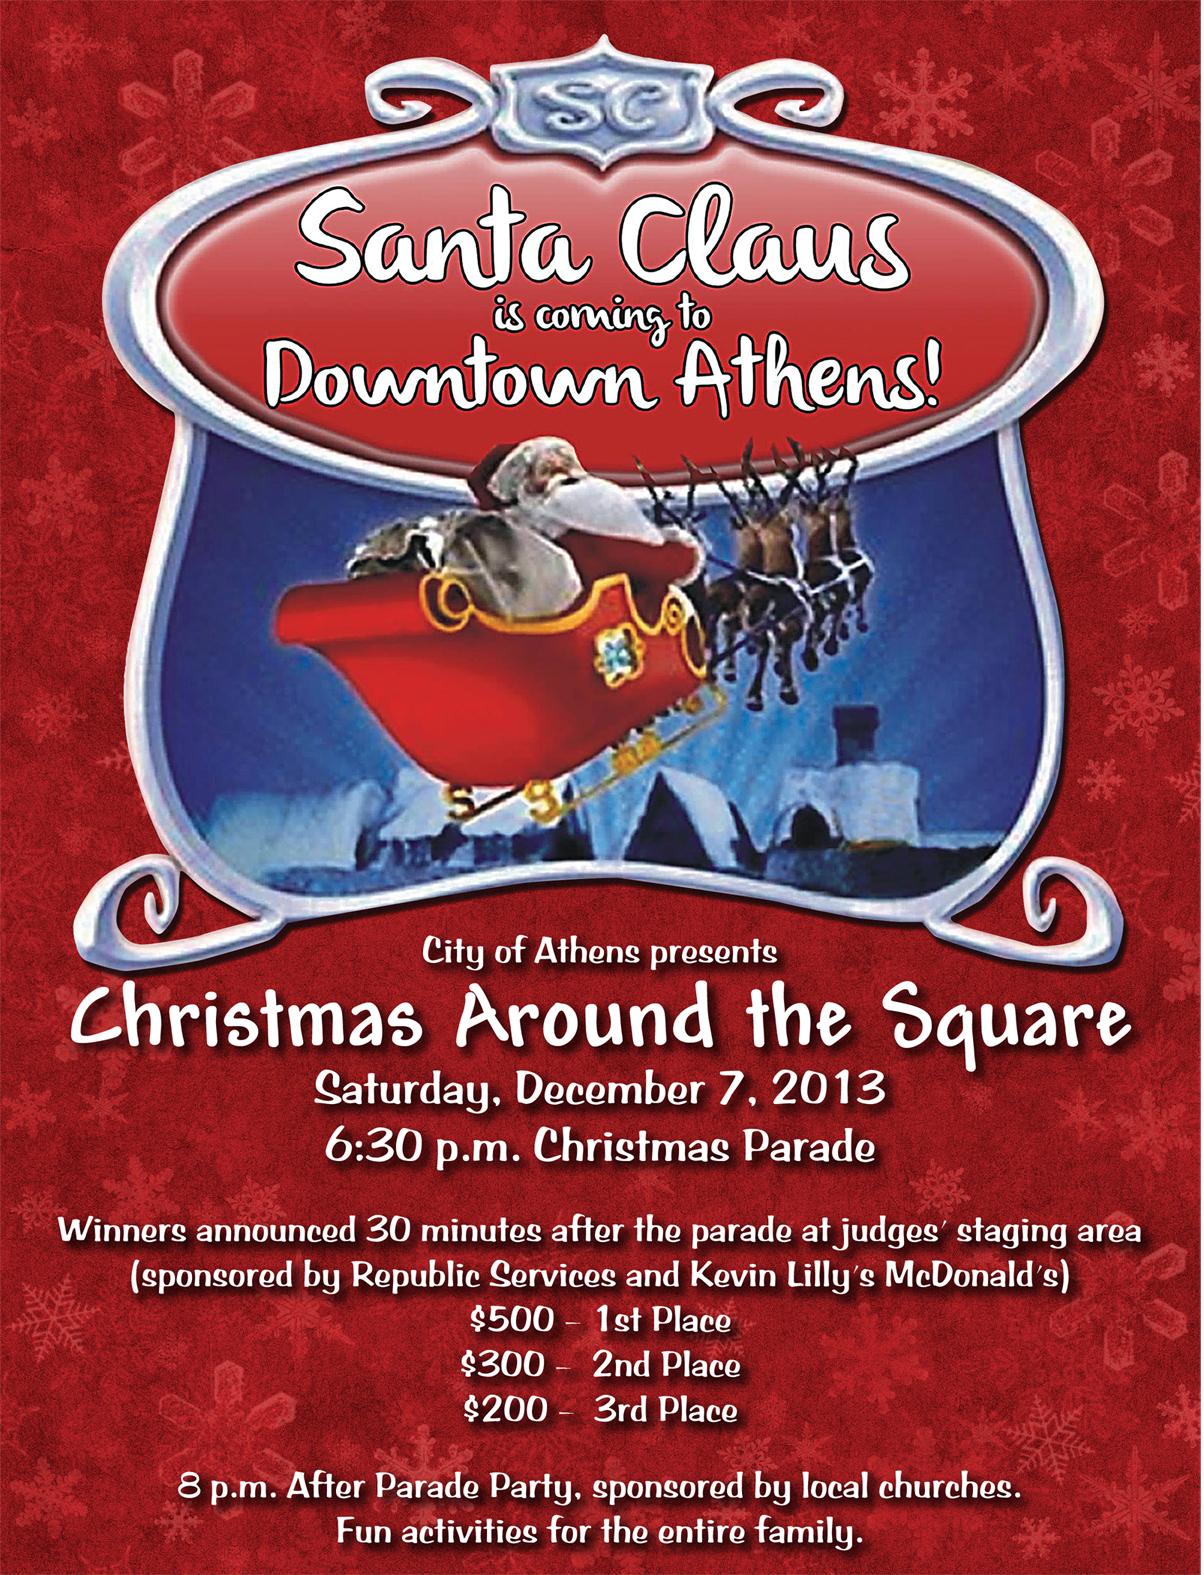 athens christmas parade slated for december 7